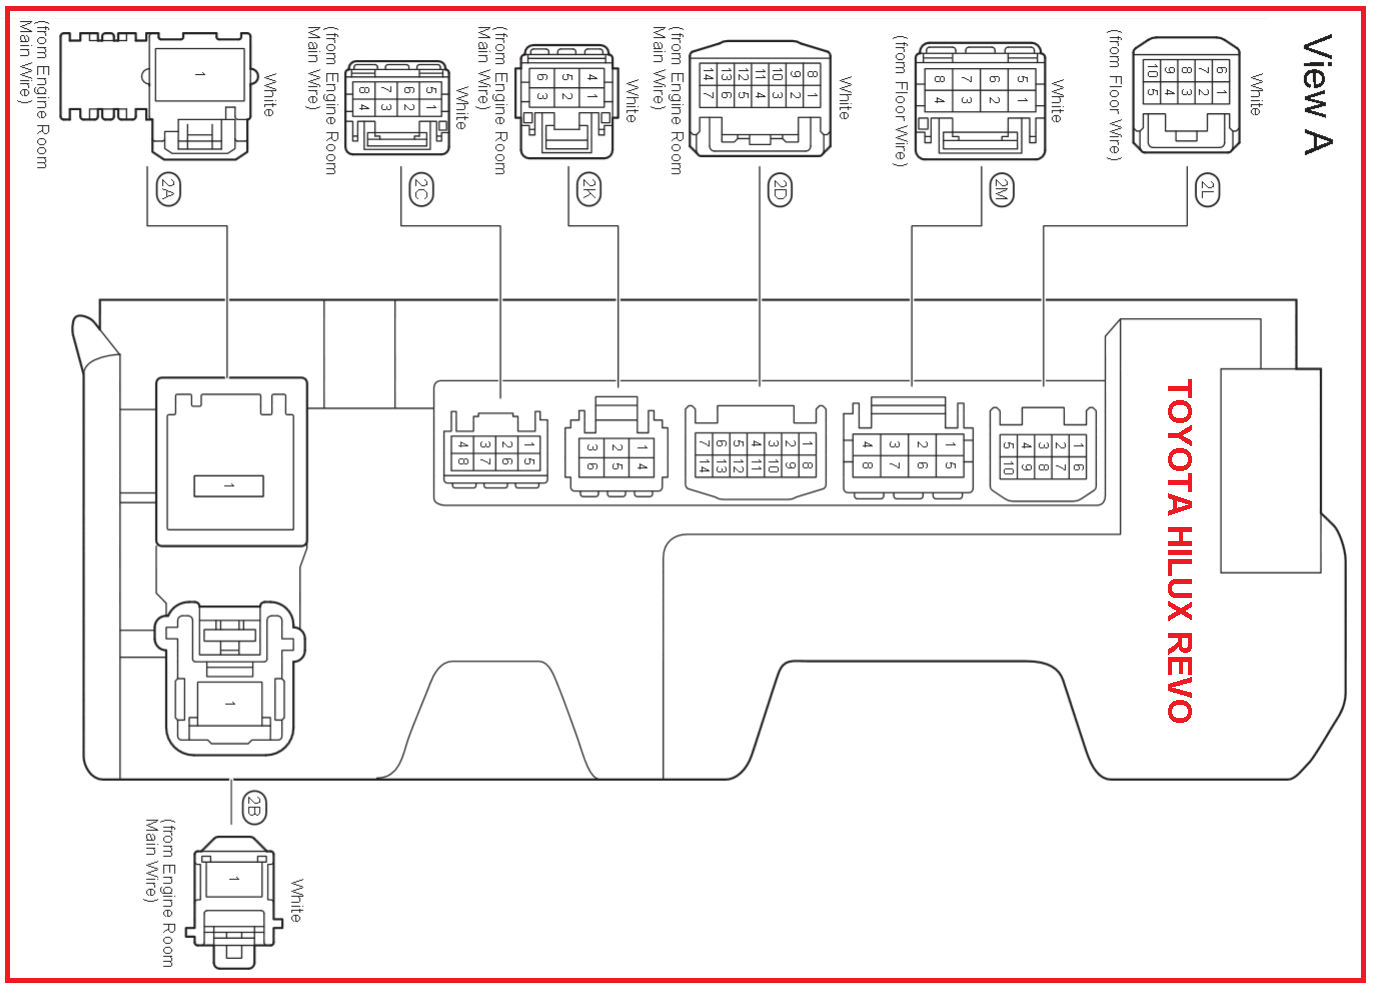 medium resolution of toyota hilux revo wiring wiring diagram toolbox toyota hilux revo wiring